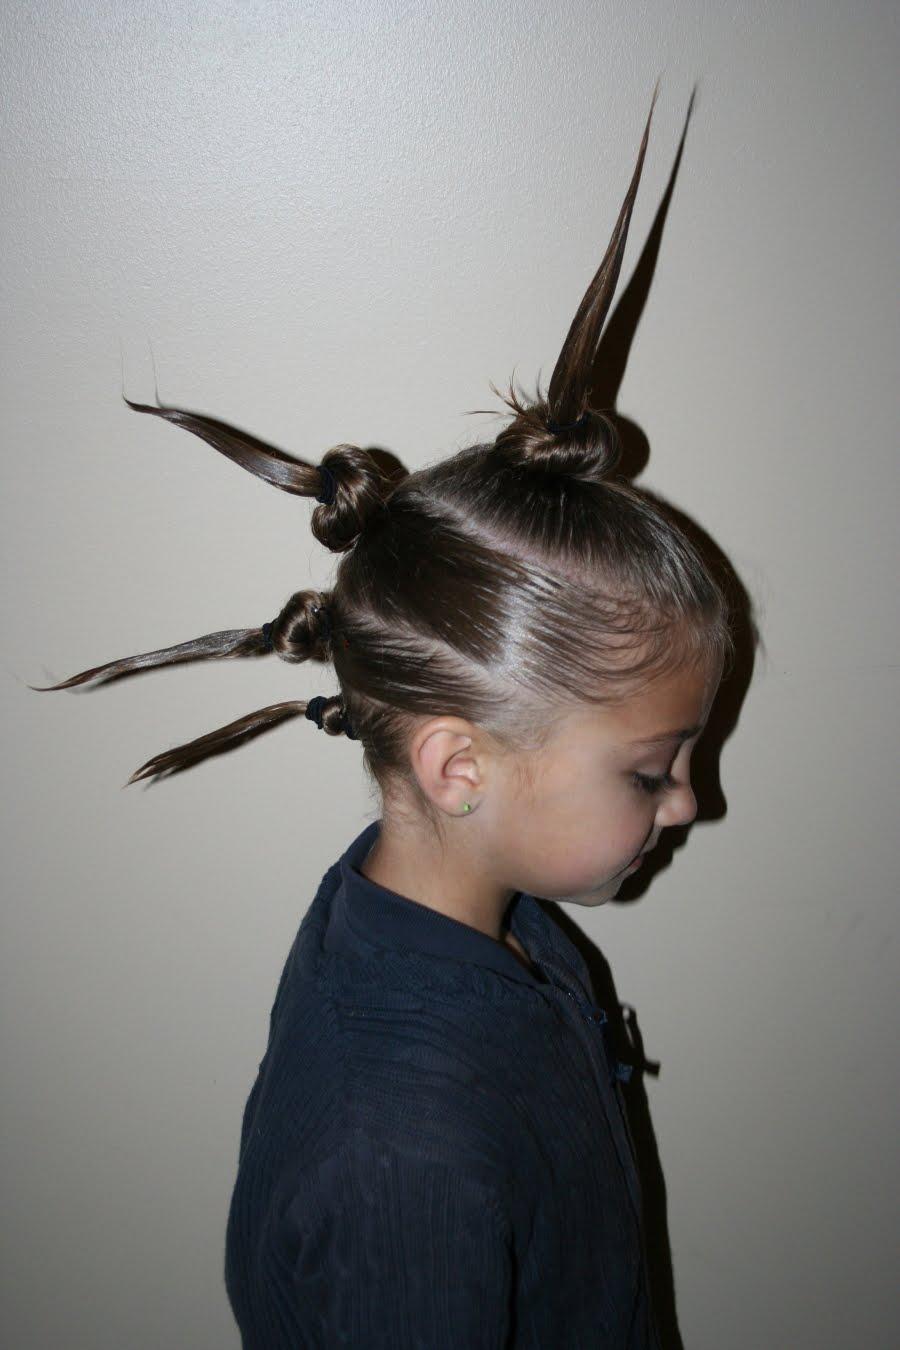 Strange Our Crazy Hair Day Cute Girls Hairstyles Short Hairstyles For Black Women Fulllsitofus